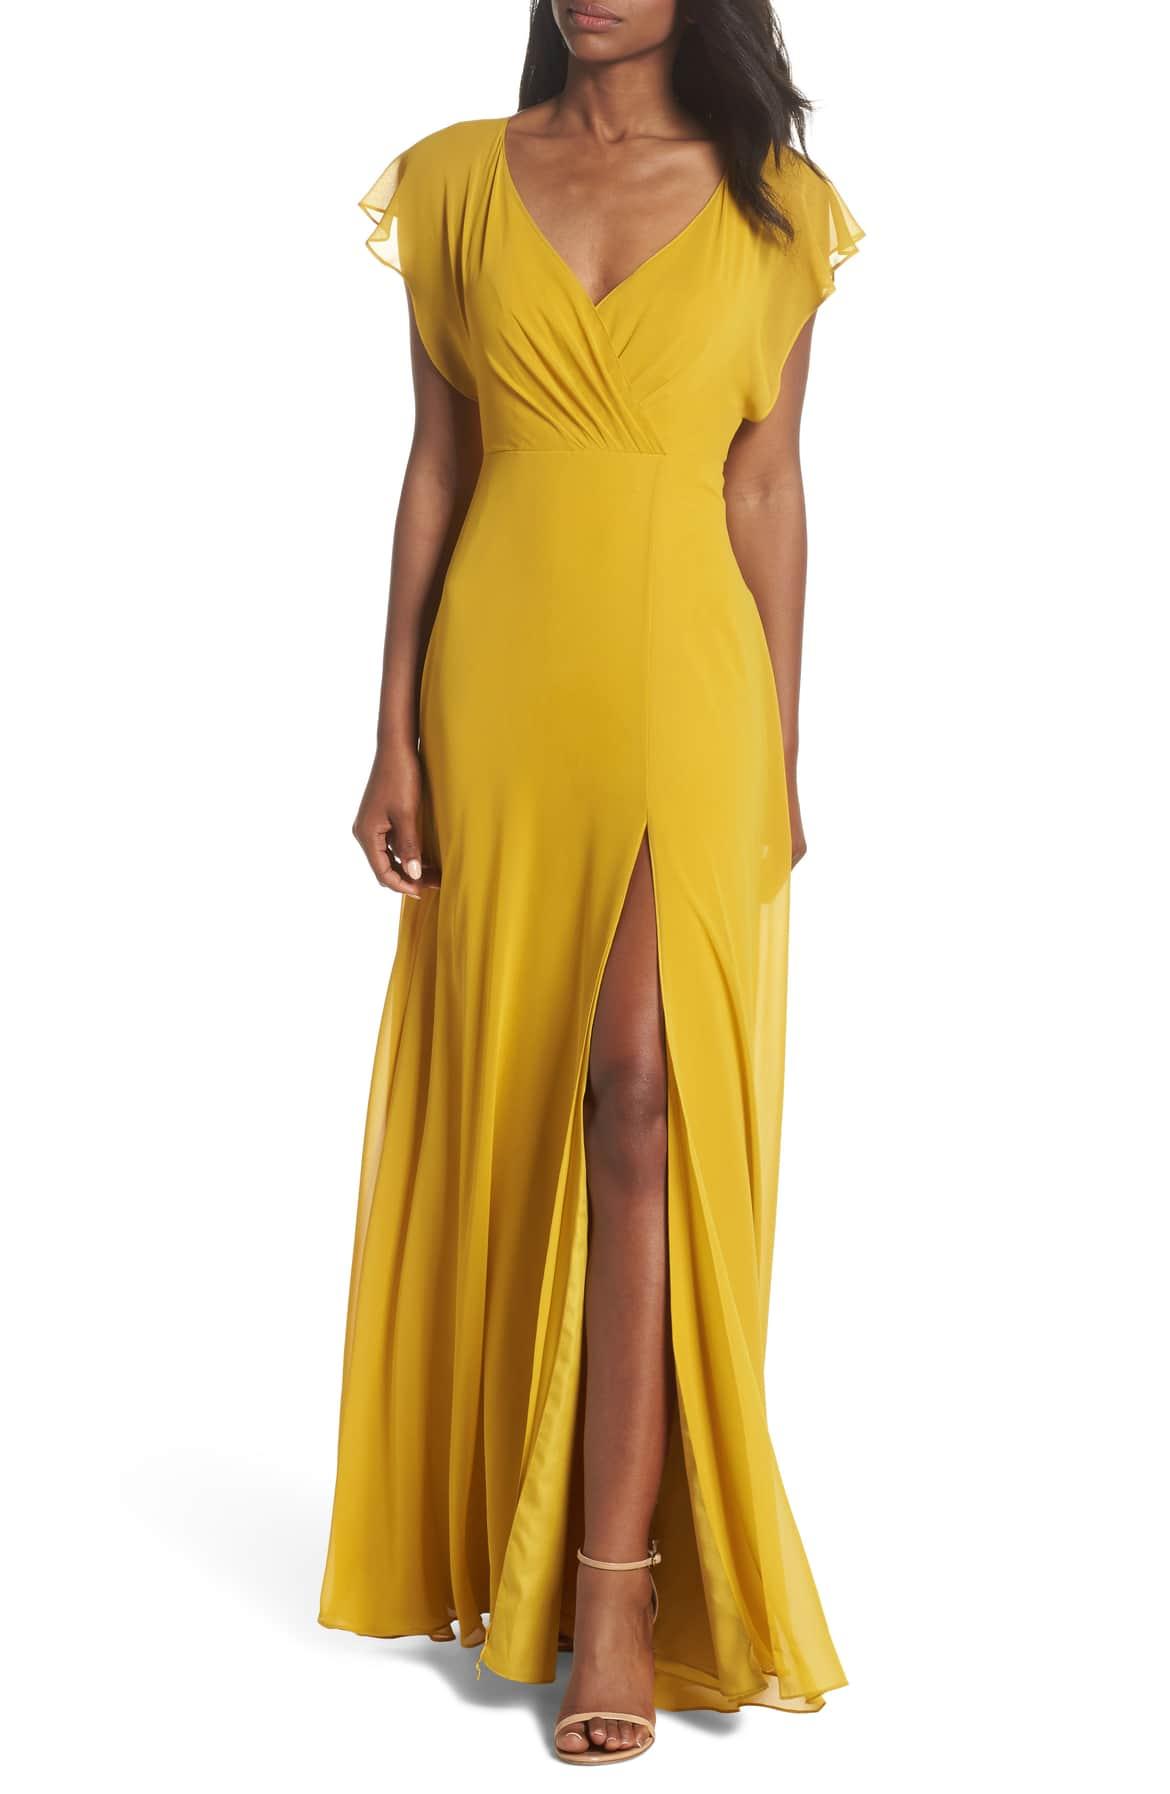 Jenny Yoo Alanna Open Back Chiffon Gown - $285.00